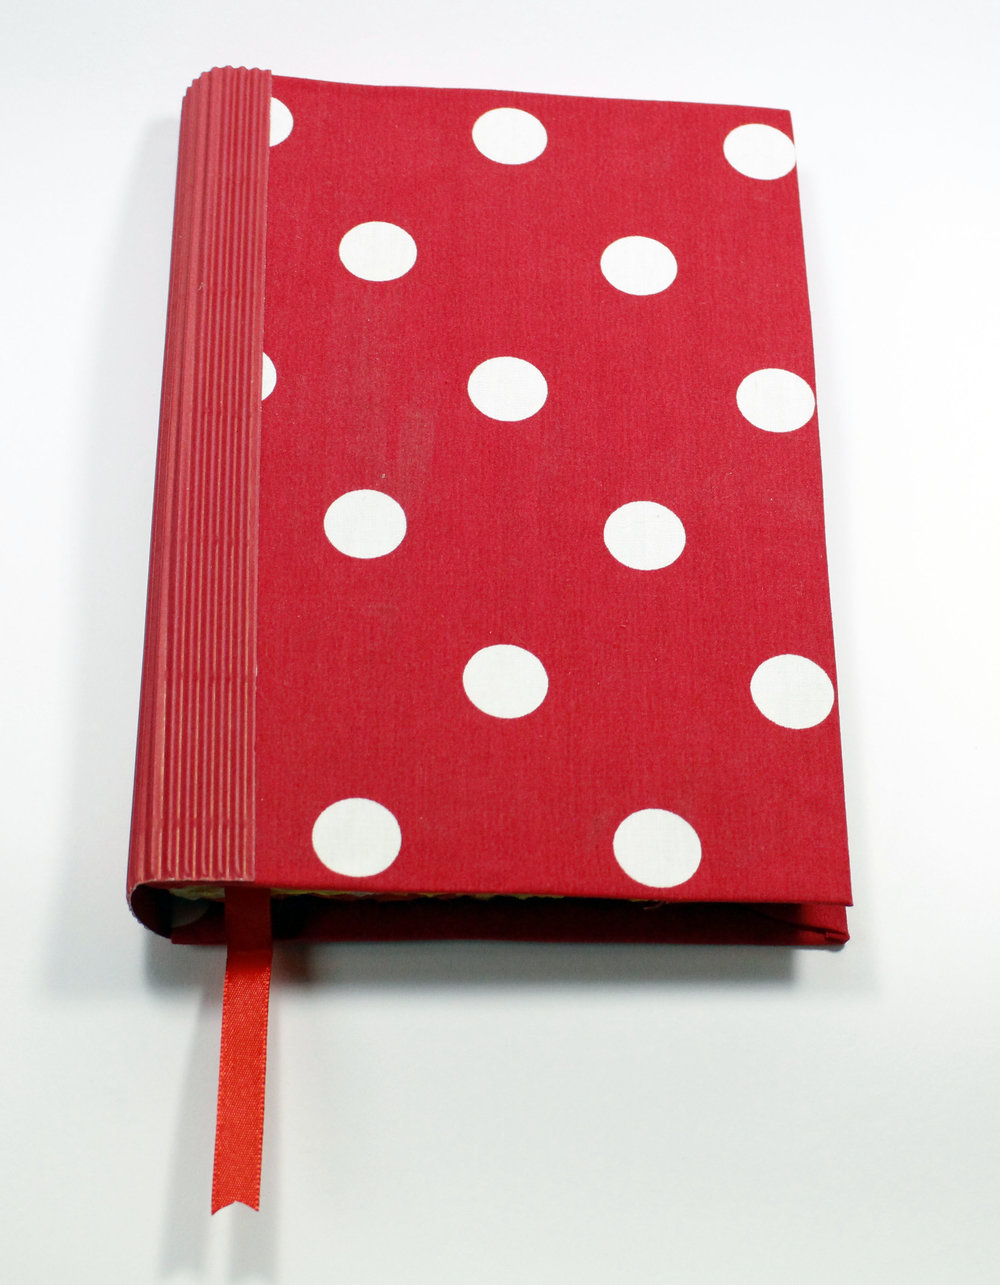 journal-polka-dots-red_1.JPG